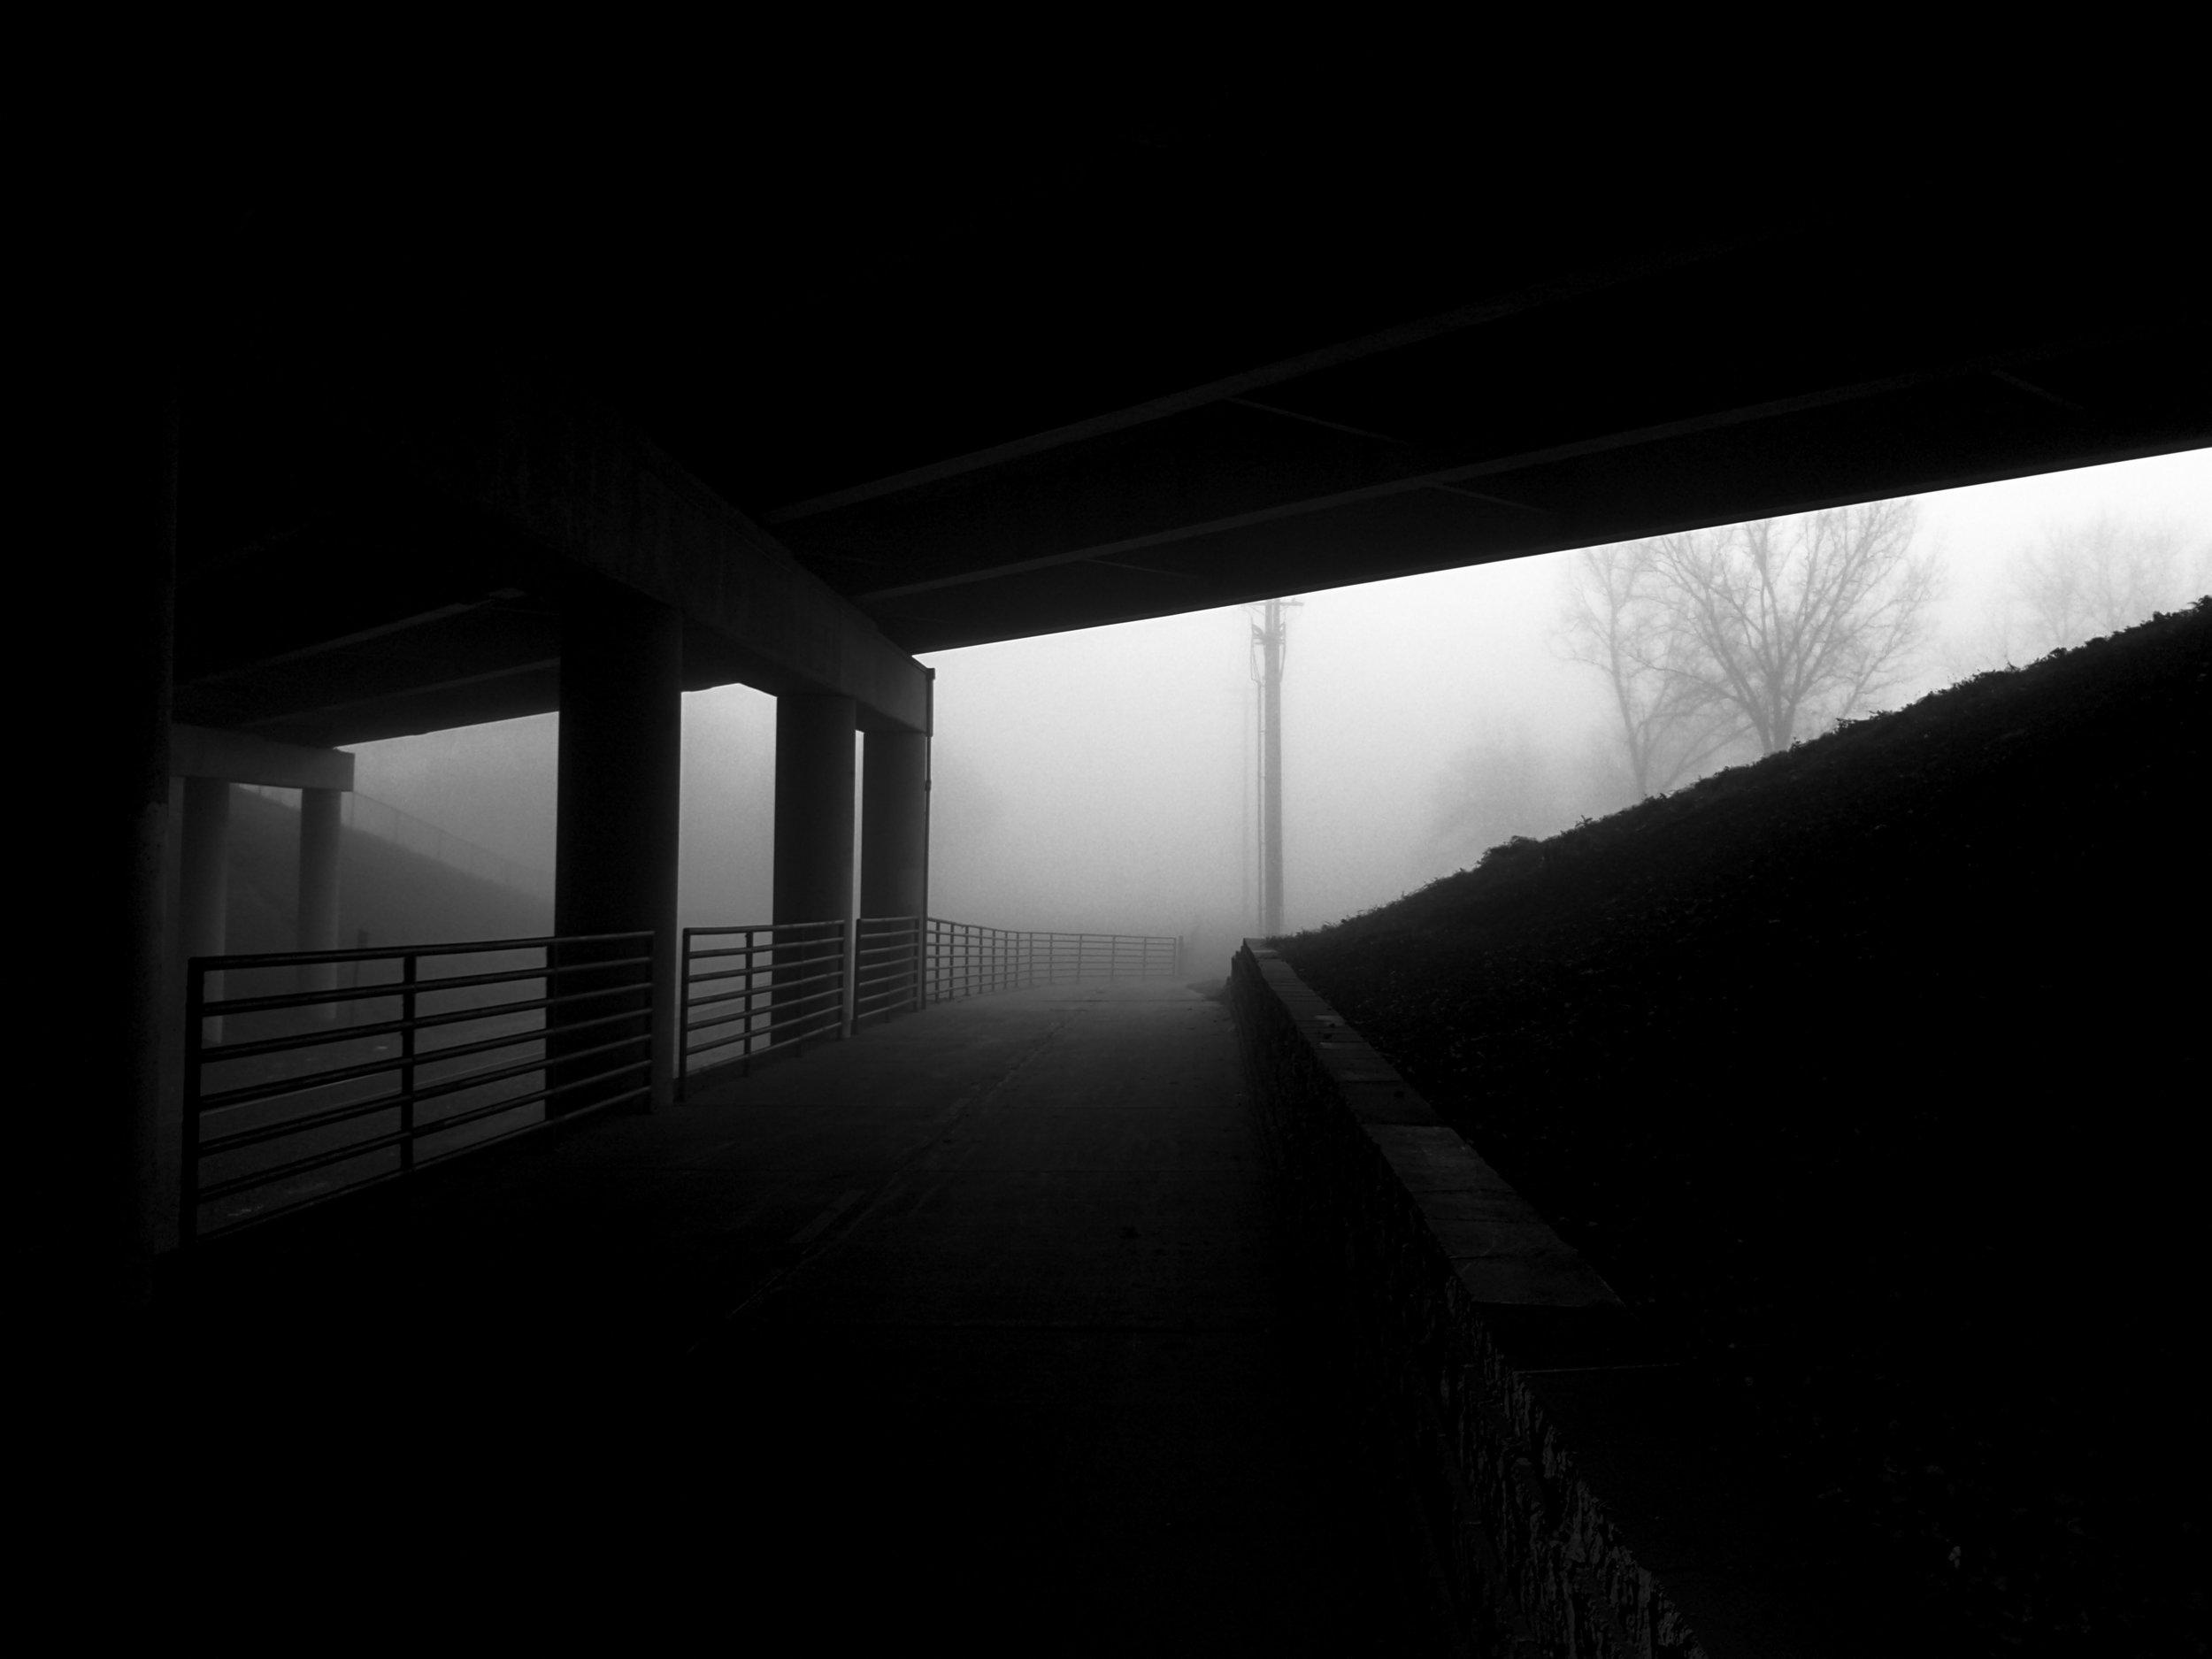 Underpass. West Beltline Highway. Madison, Wisconsin. November 2016. © William D. Walker